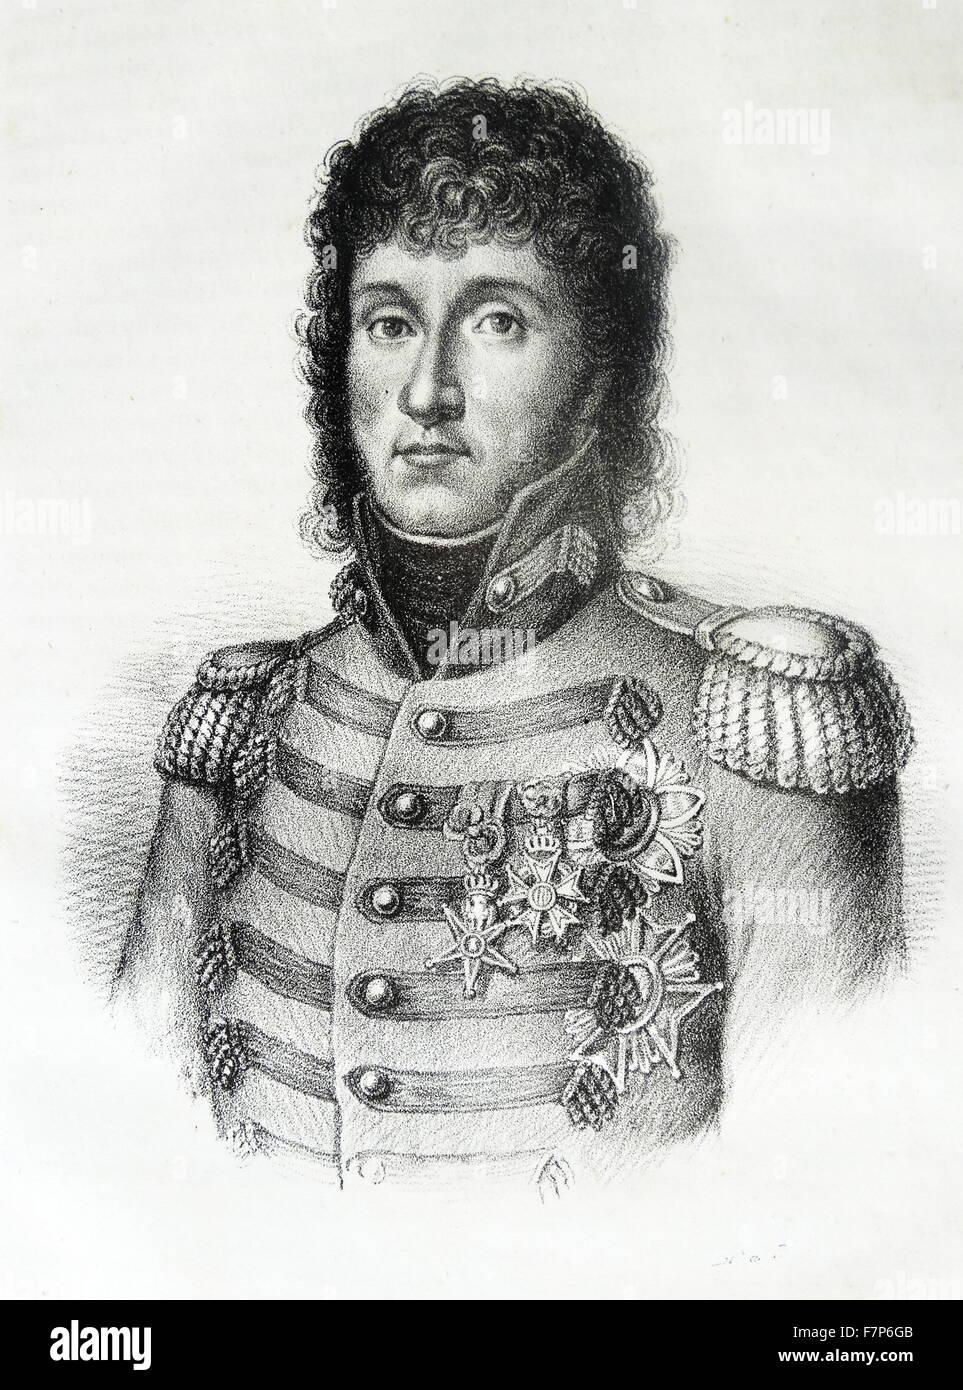 Marshal Joachim-Napoléon Murat ( 1767 – 1815) King of Naples from 1808 to 1815. - Stock Image